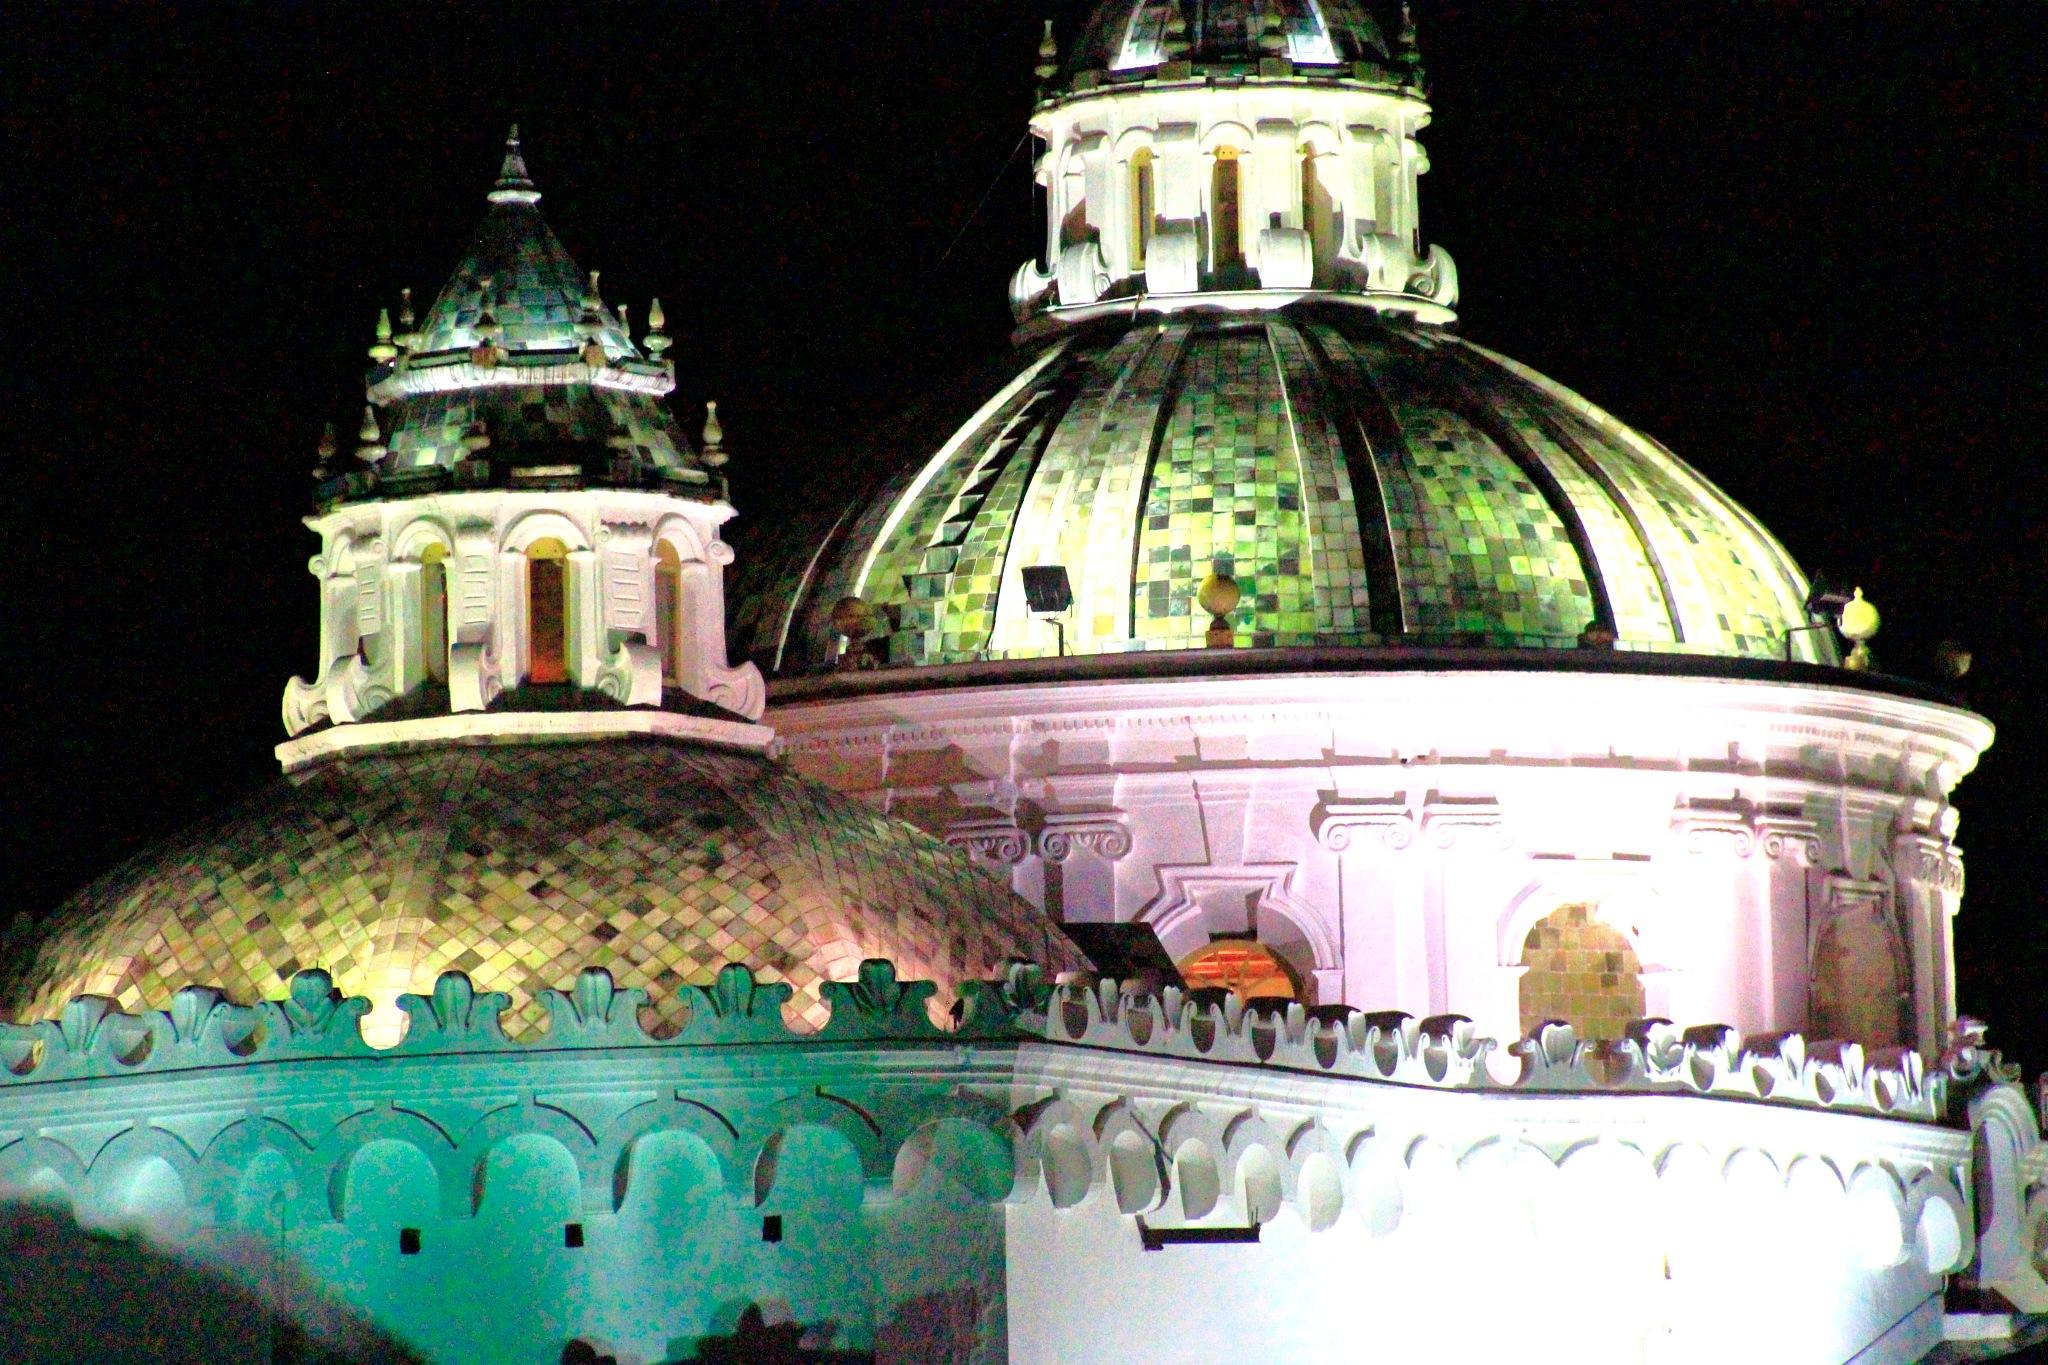 Beautiful church colors at night by Ricardo Basque